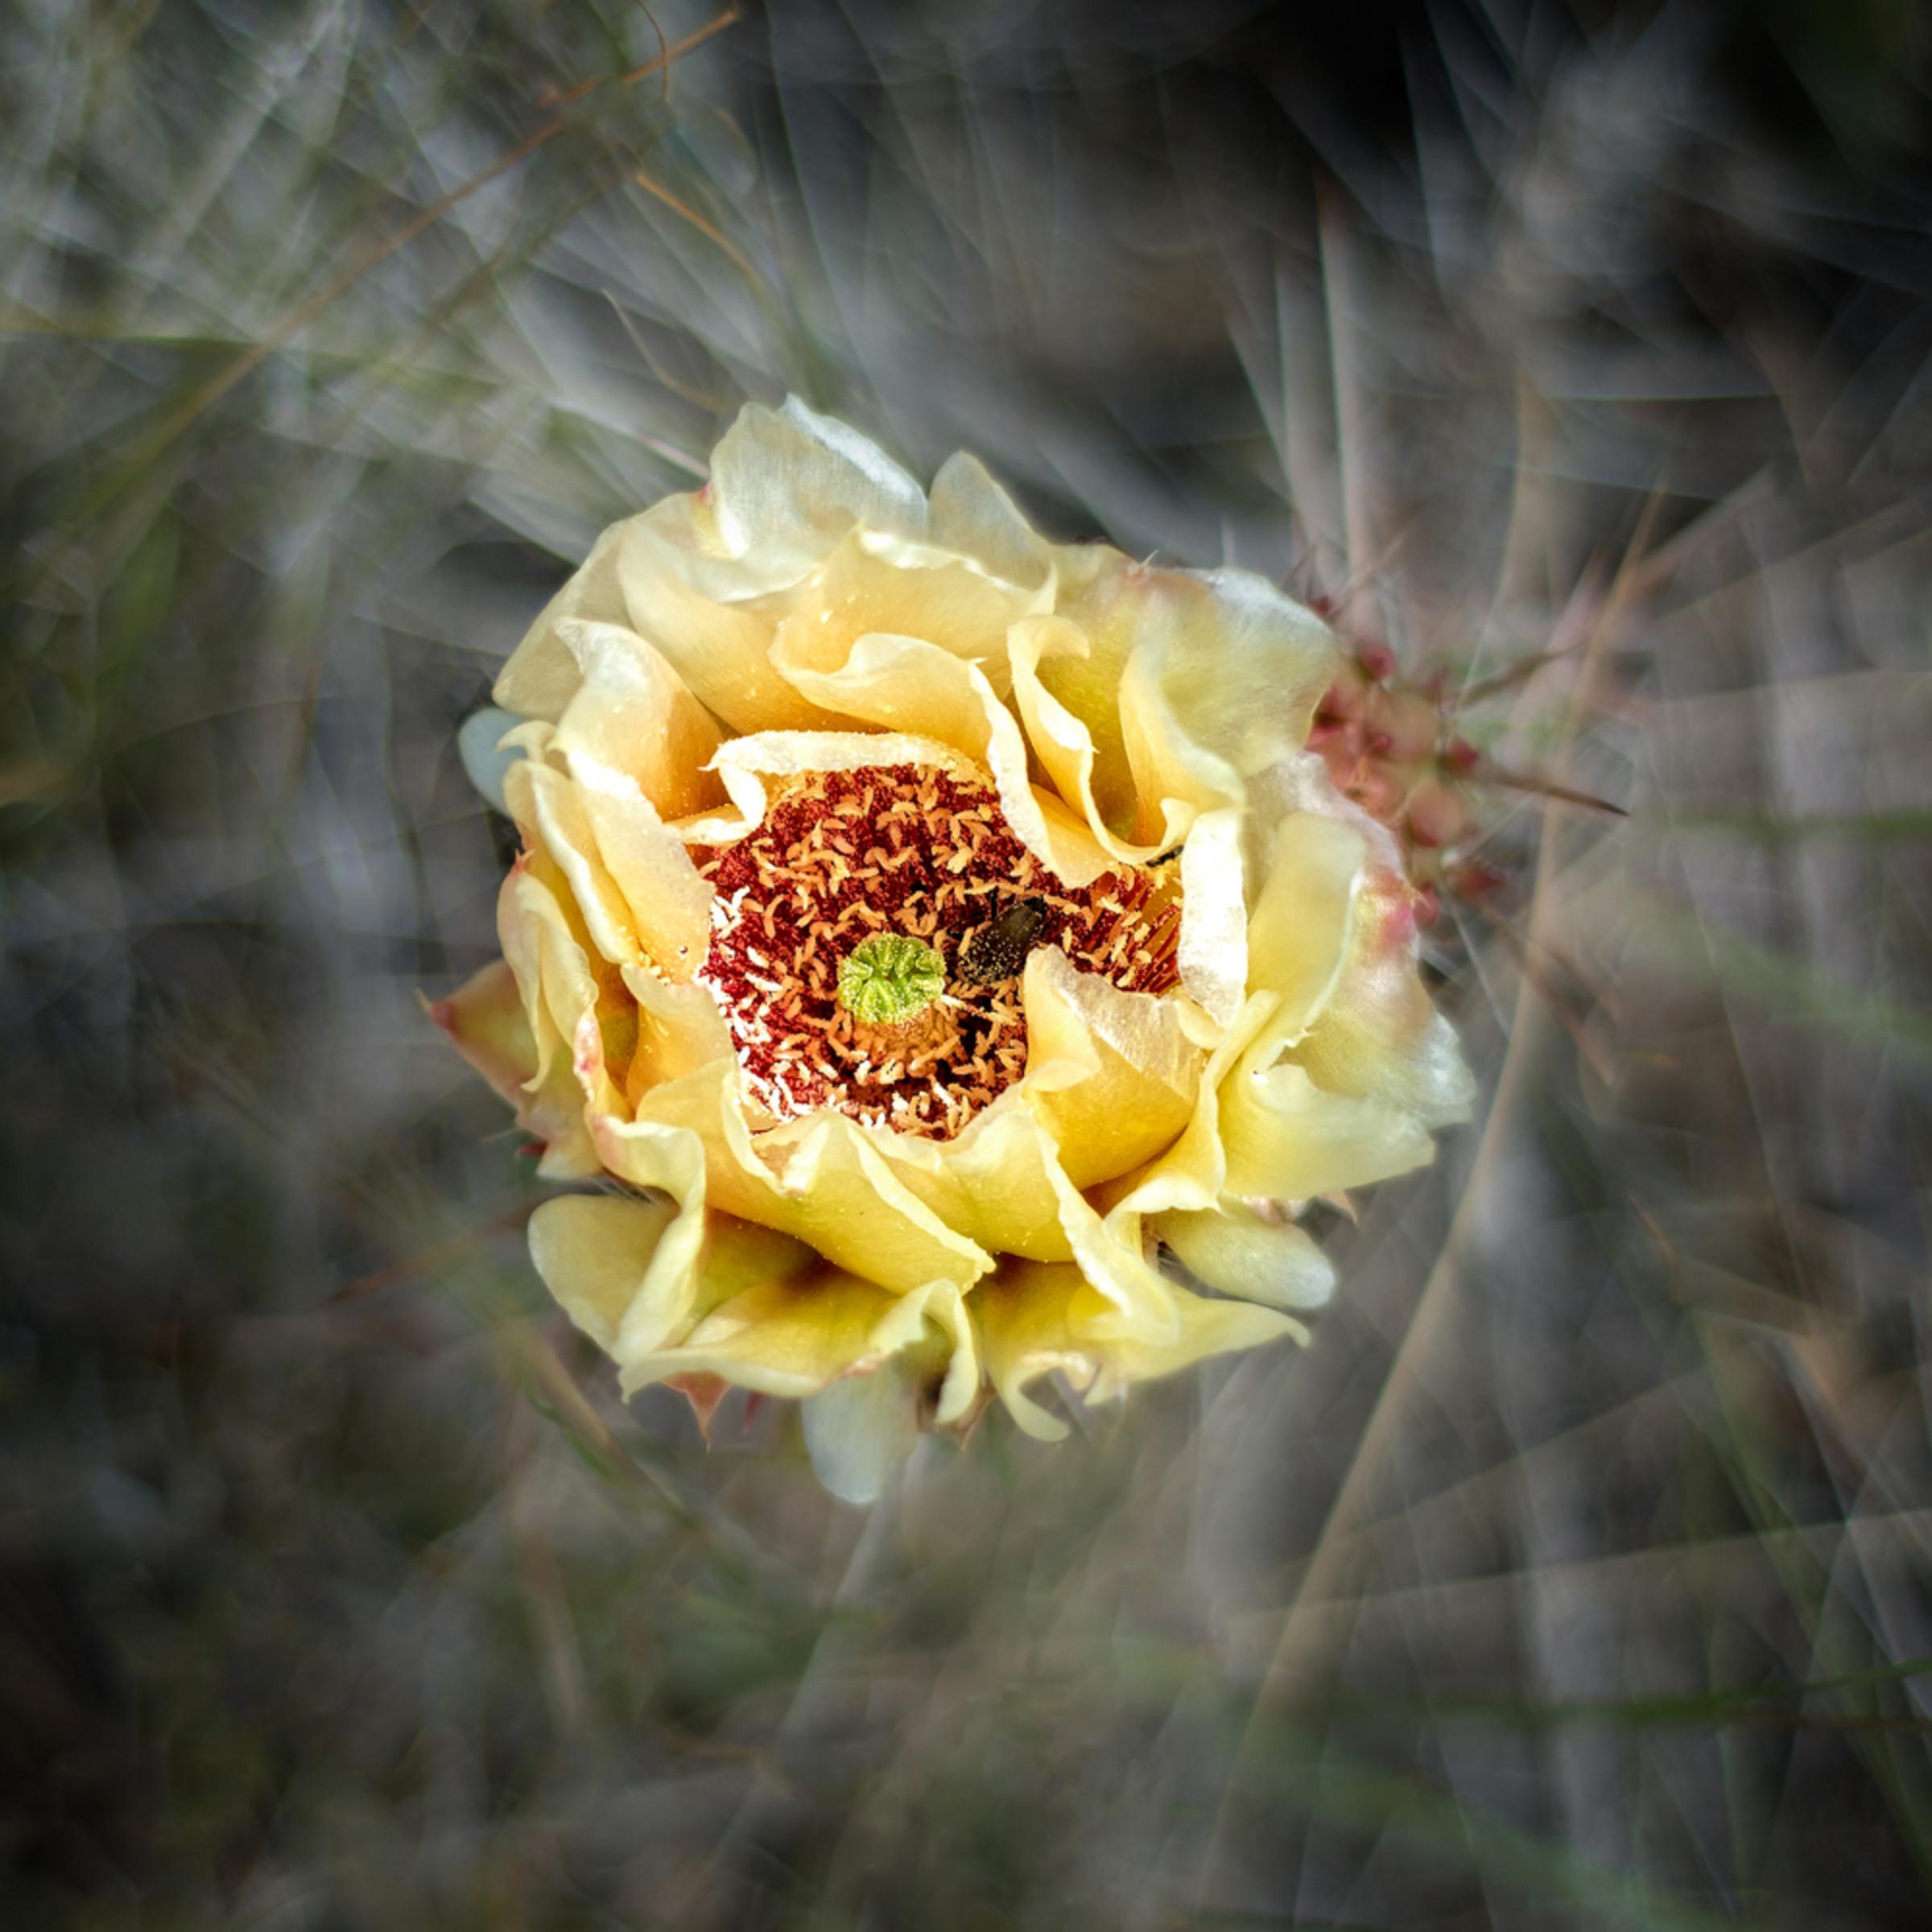 Cactus flower nprs6w